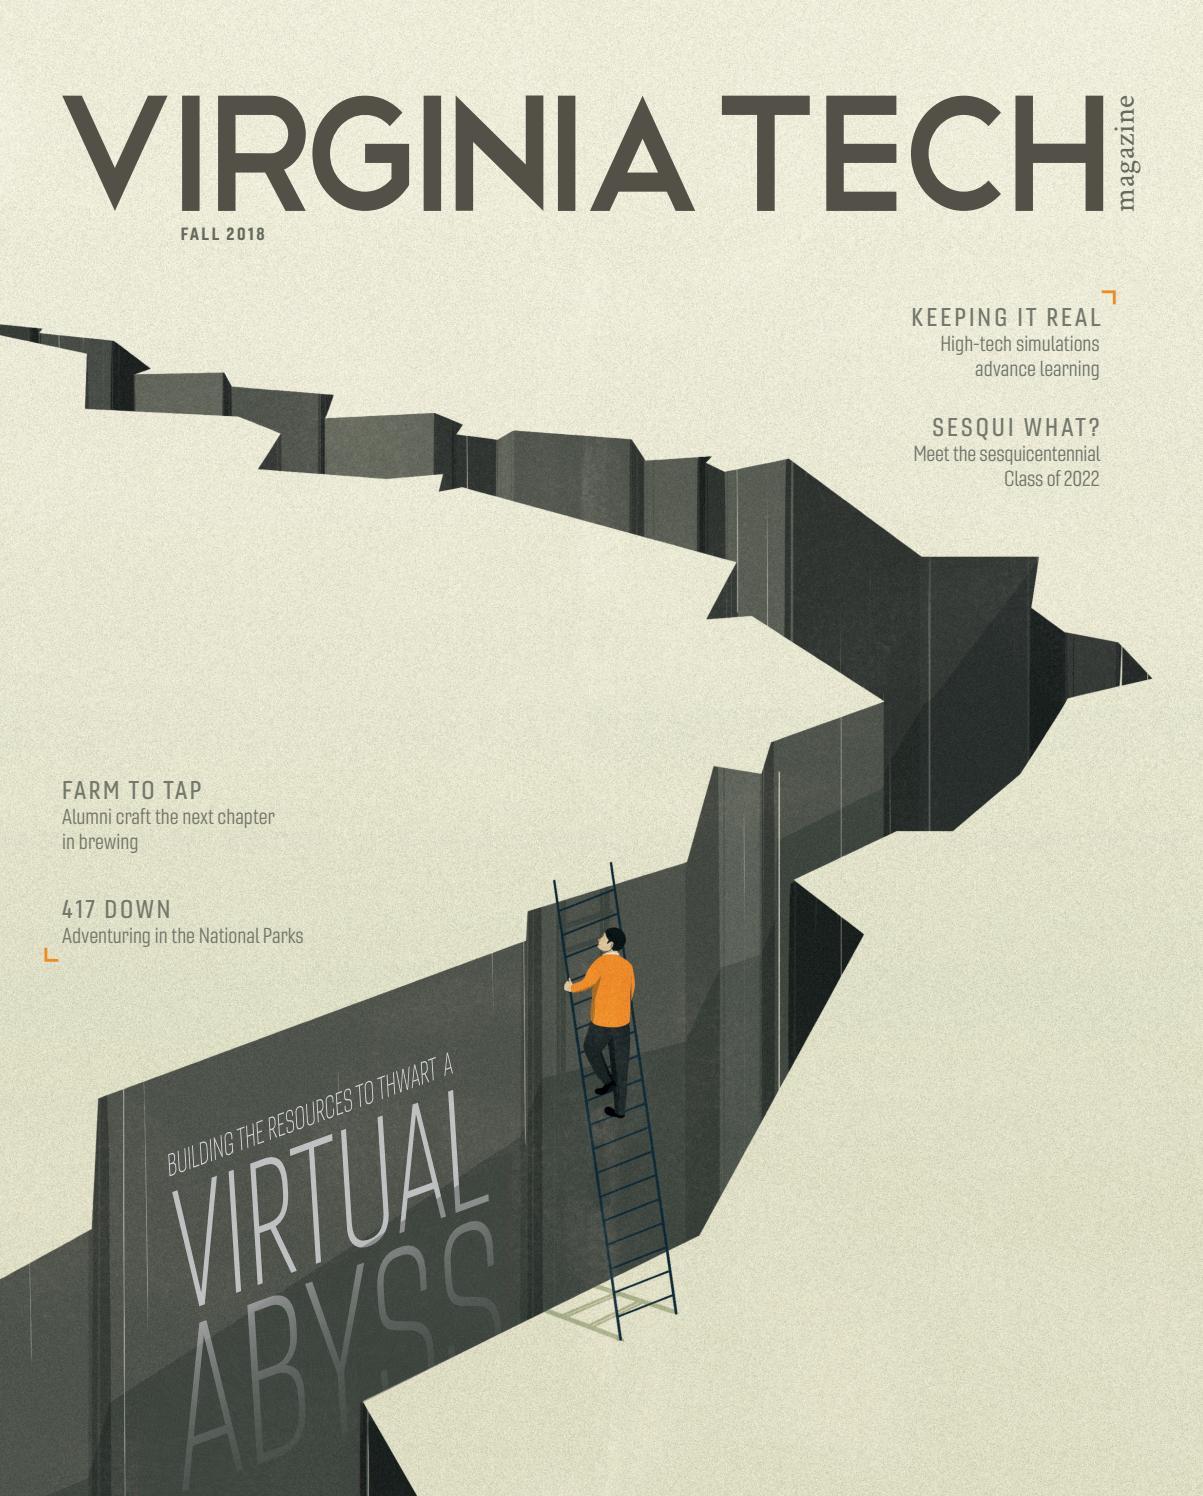 Virginia Tech Calendar Fall 2022.Virginia Tech Magazine Fall 2018 By Virginia Tech Issuu